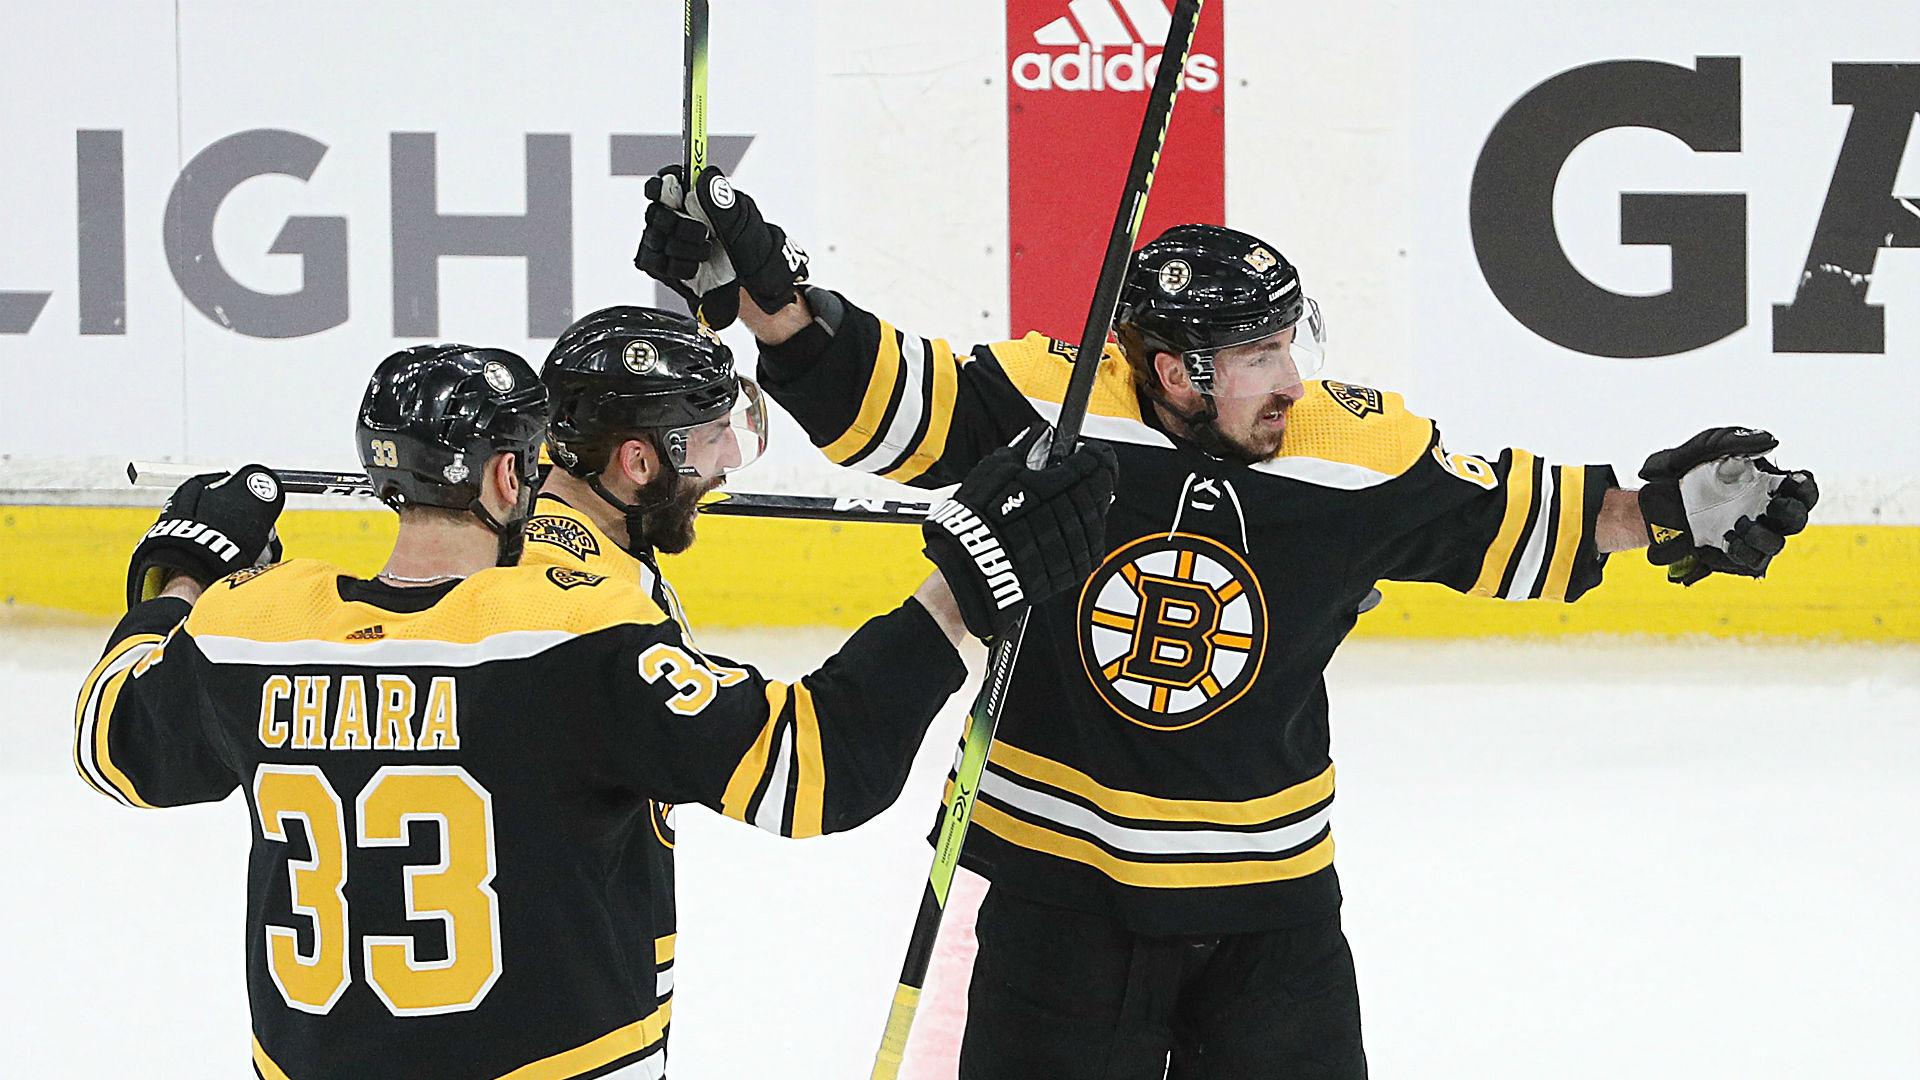 NHL 2019-20 regular season: Bruins win Presidents' Trophy, Pastrnak and Ovechkin share Rocket Richard